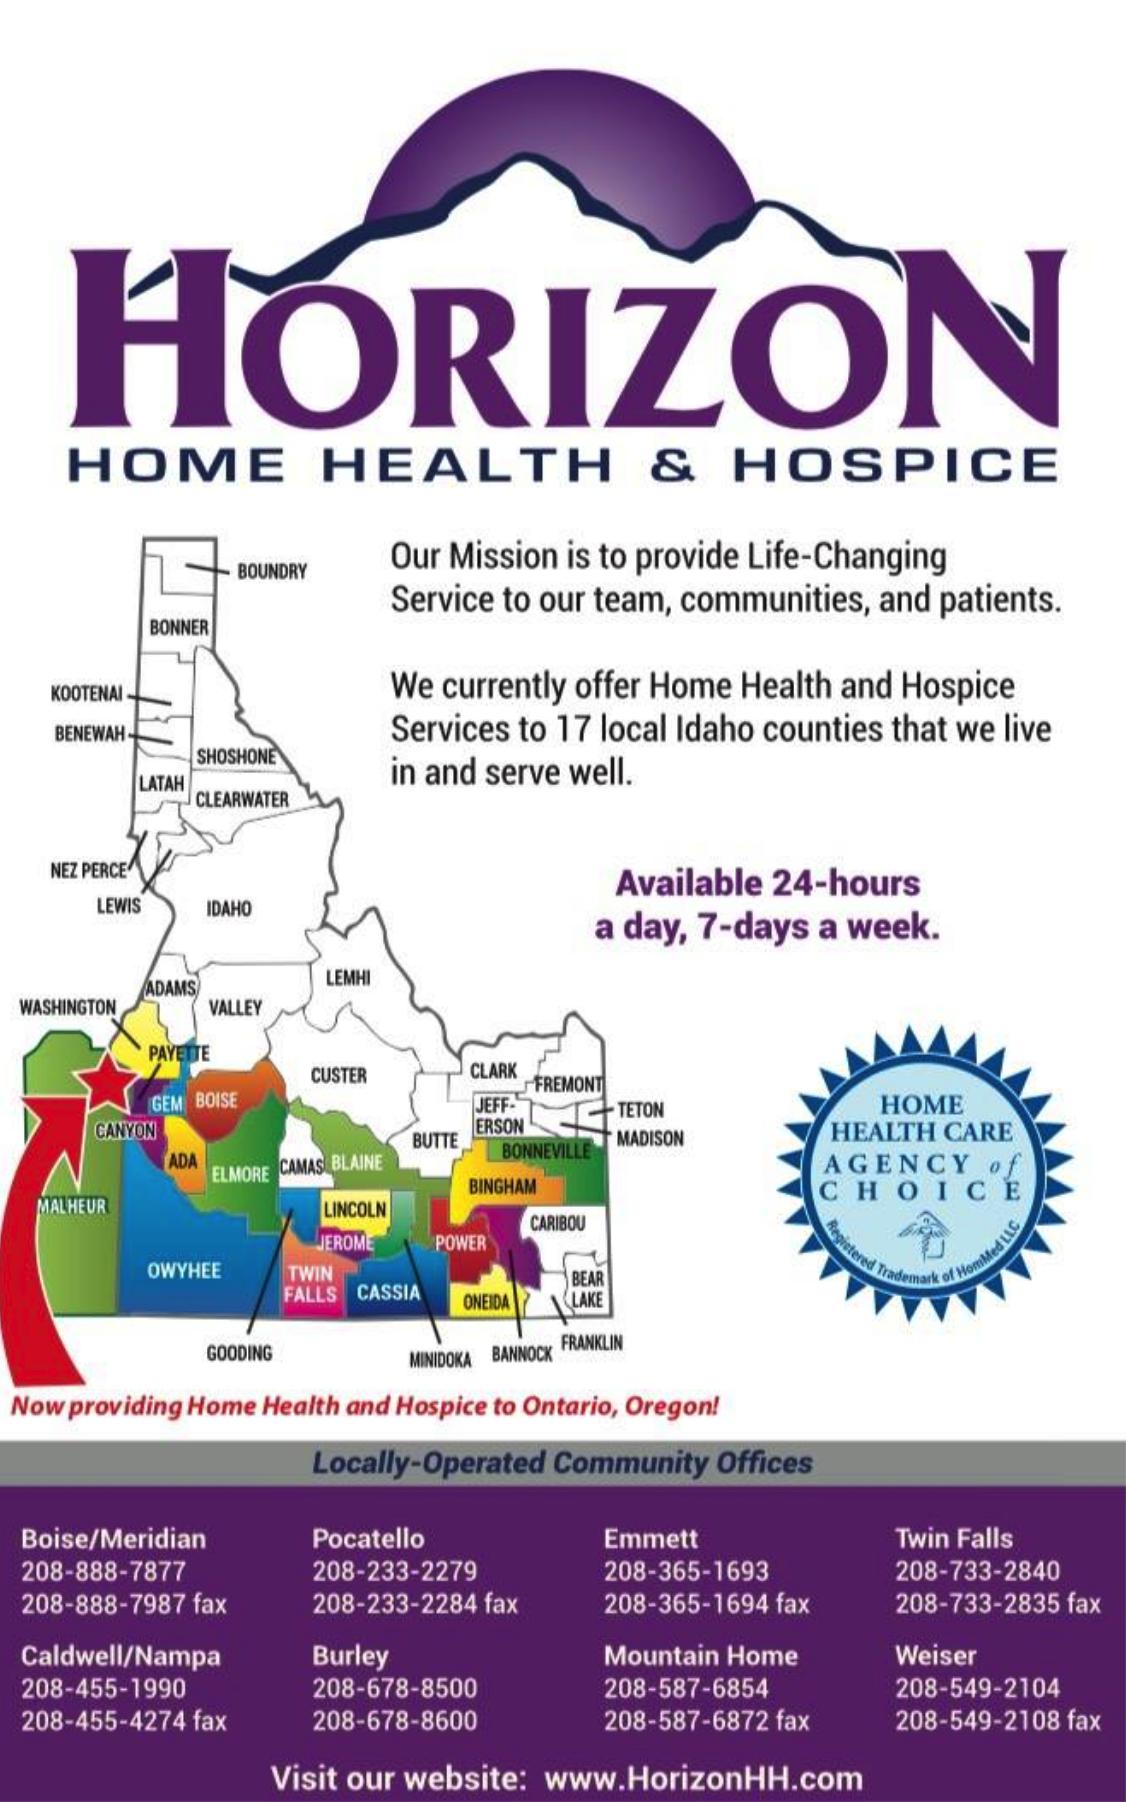 Horizon Home Health & Hospice East image 1